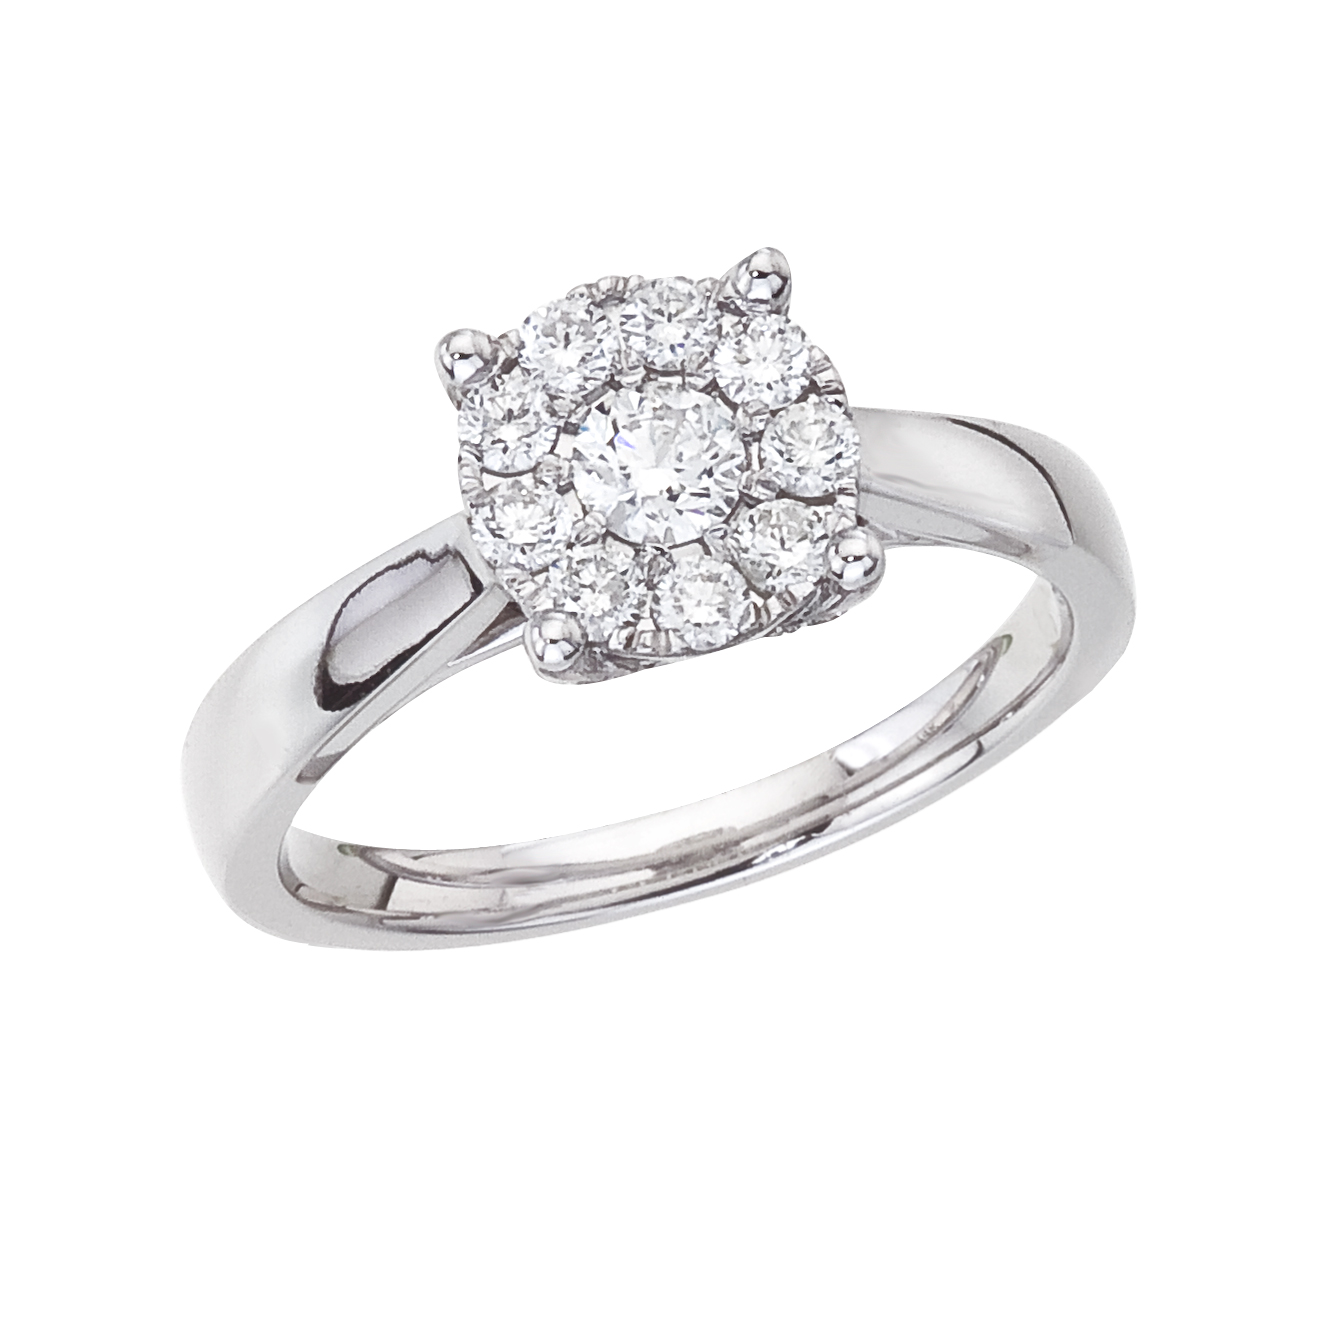 14k White gold Classic Diamond QPID Engagement Ring (0.45 tcw)